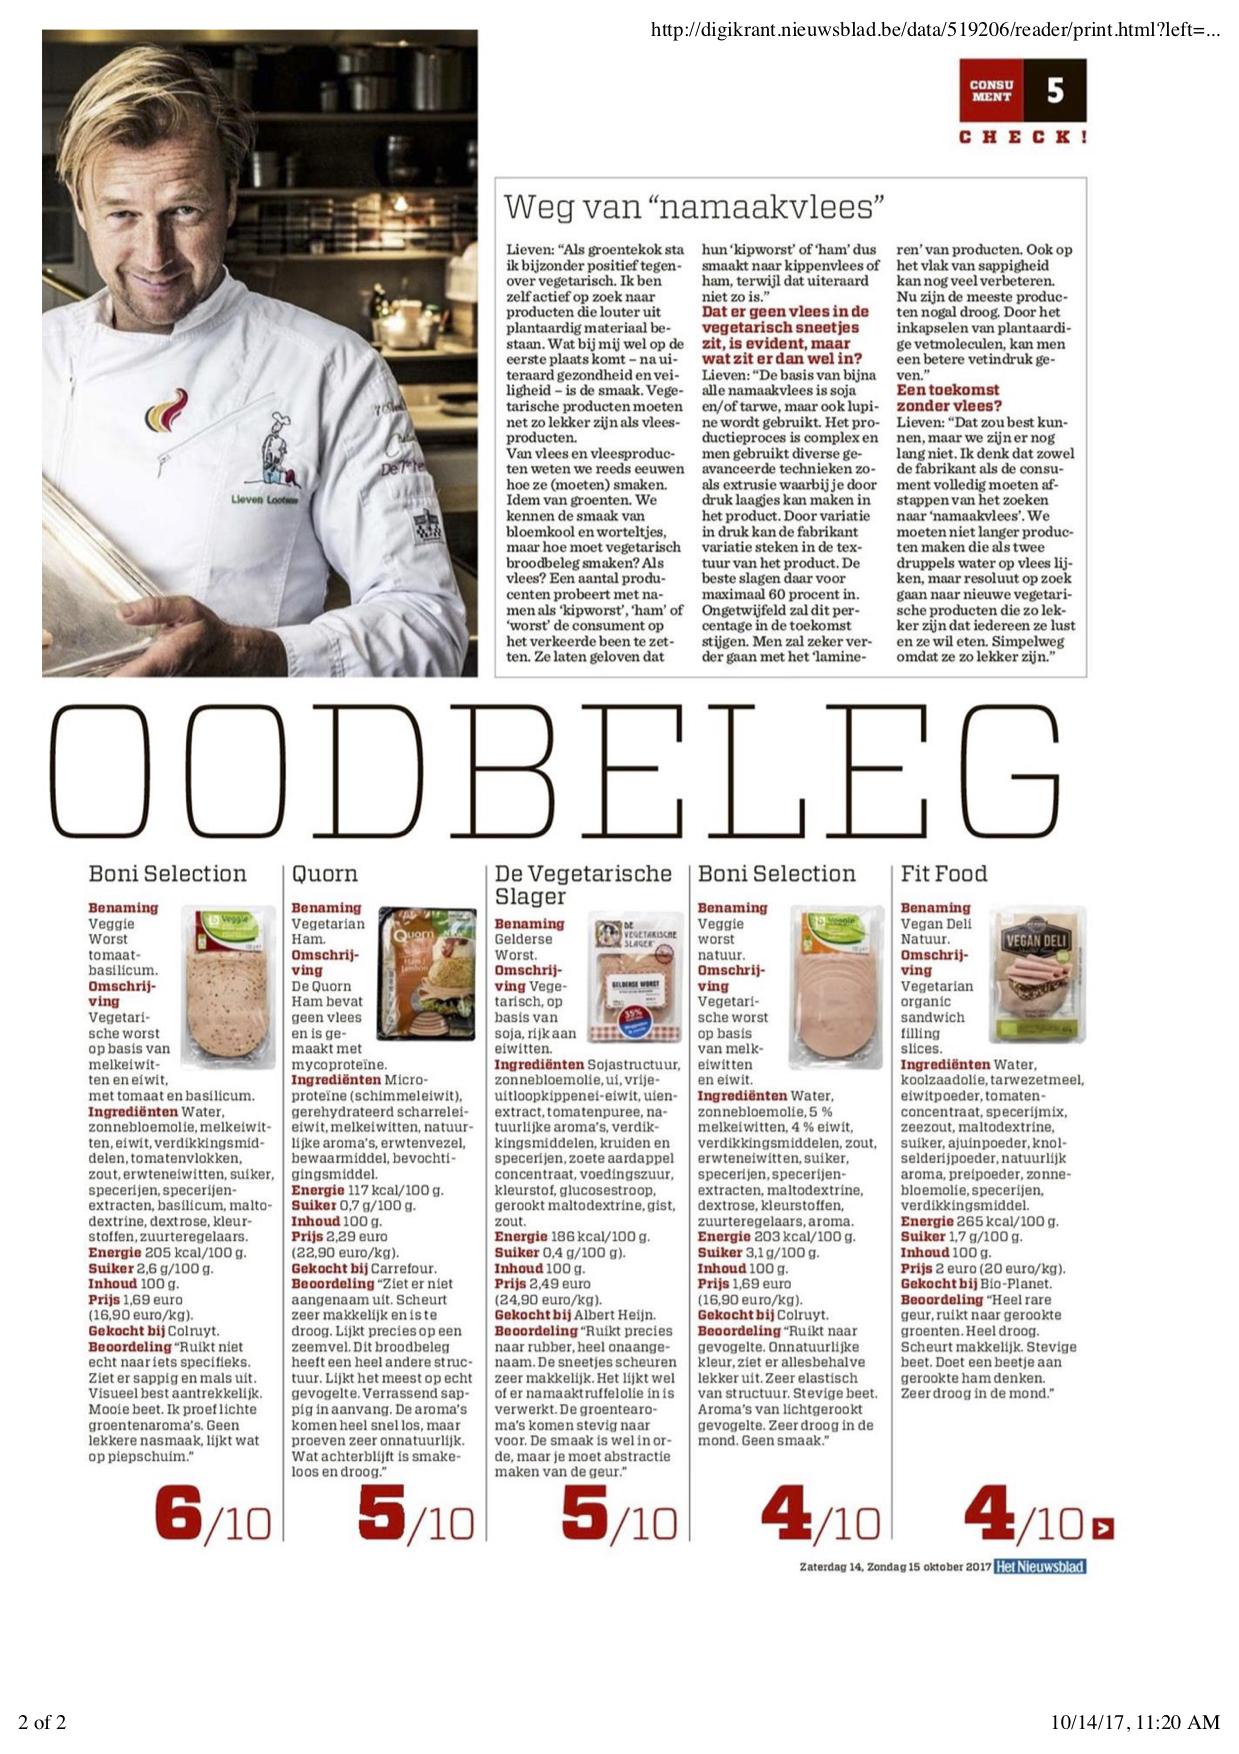 veggie broodbeleg nieuwsblad